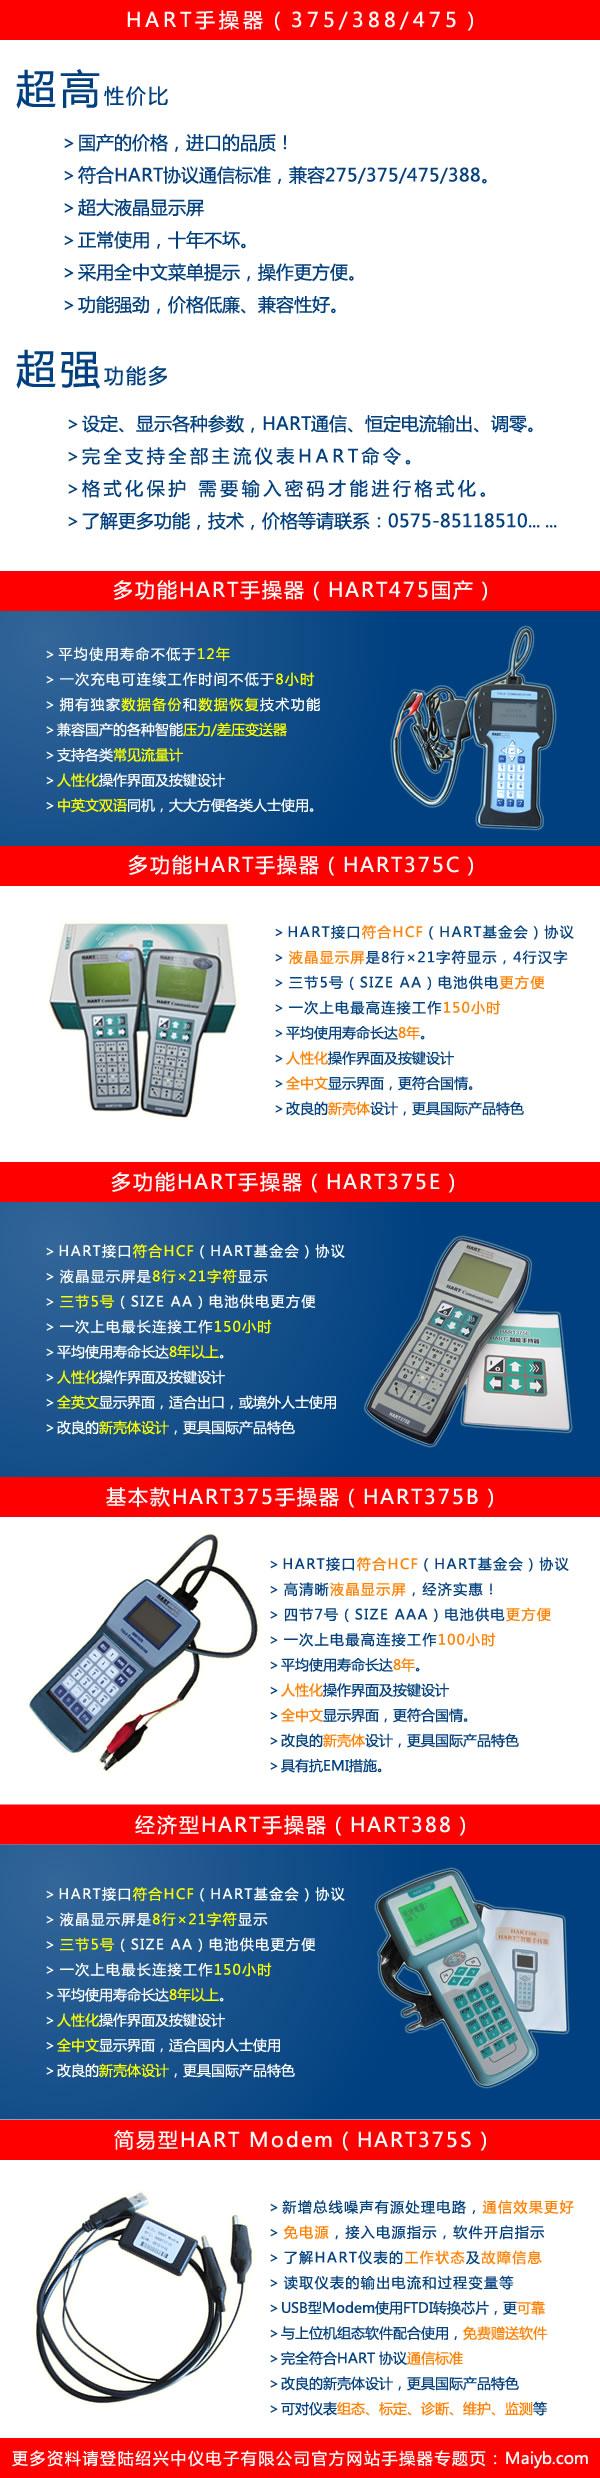 HART375手操器厂家,HART375价格